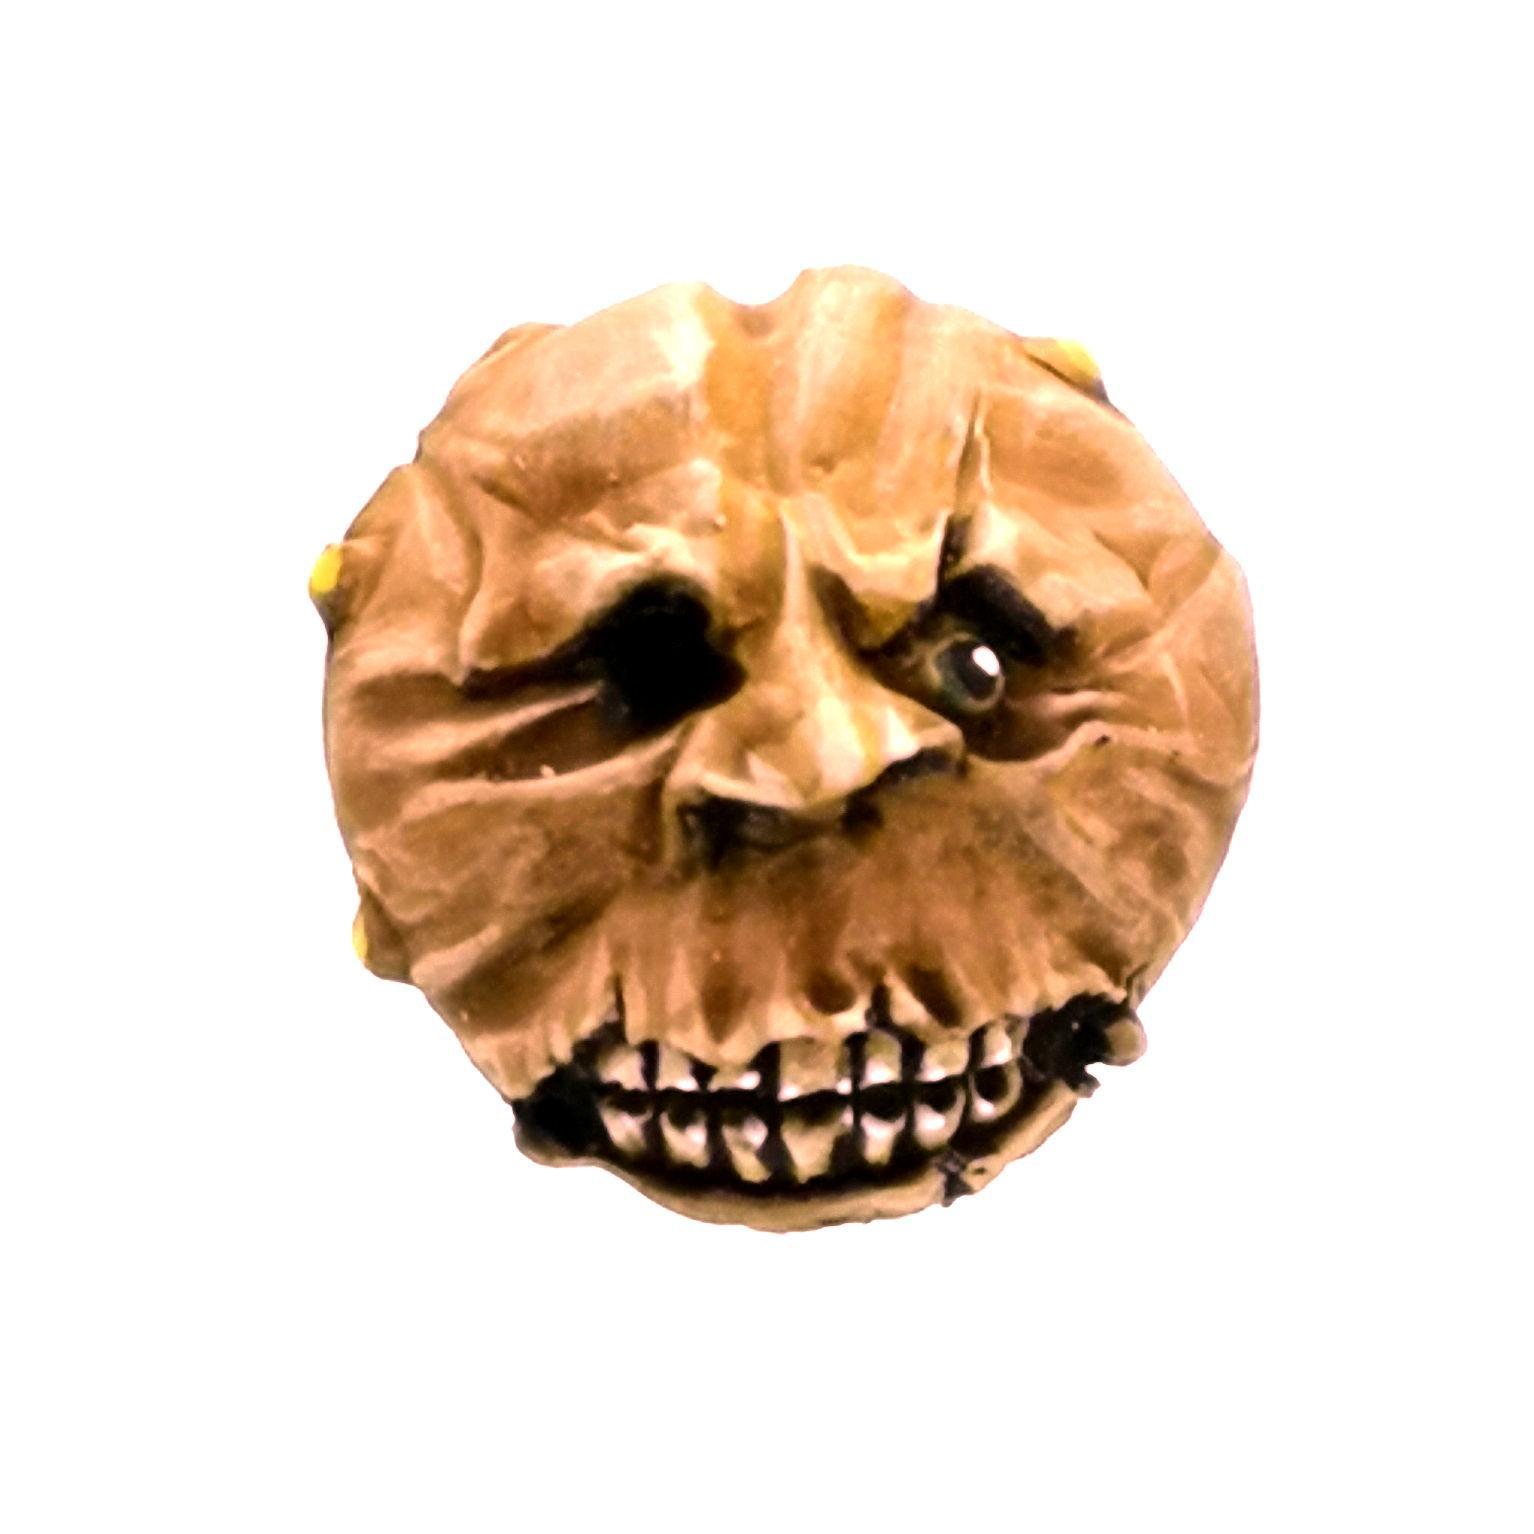 Ballmonsters, Halloween, Precinct Omega